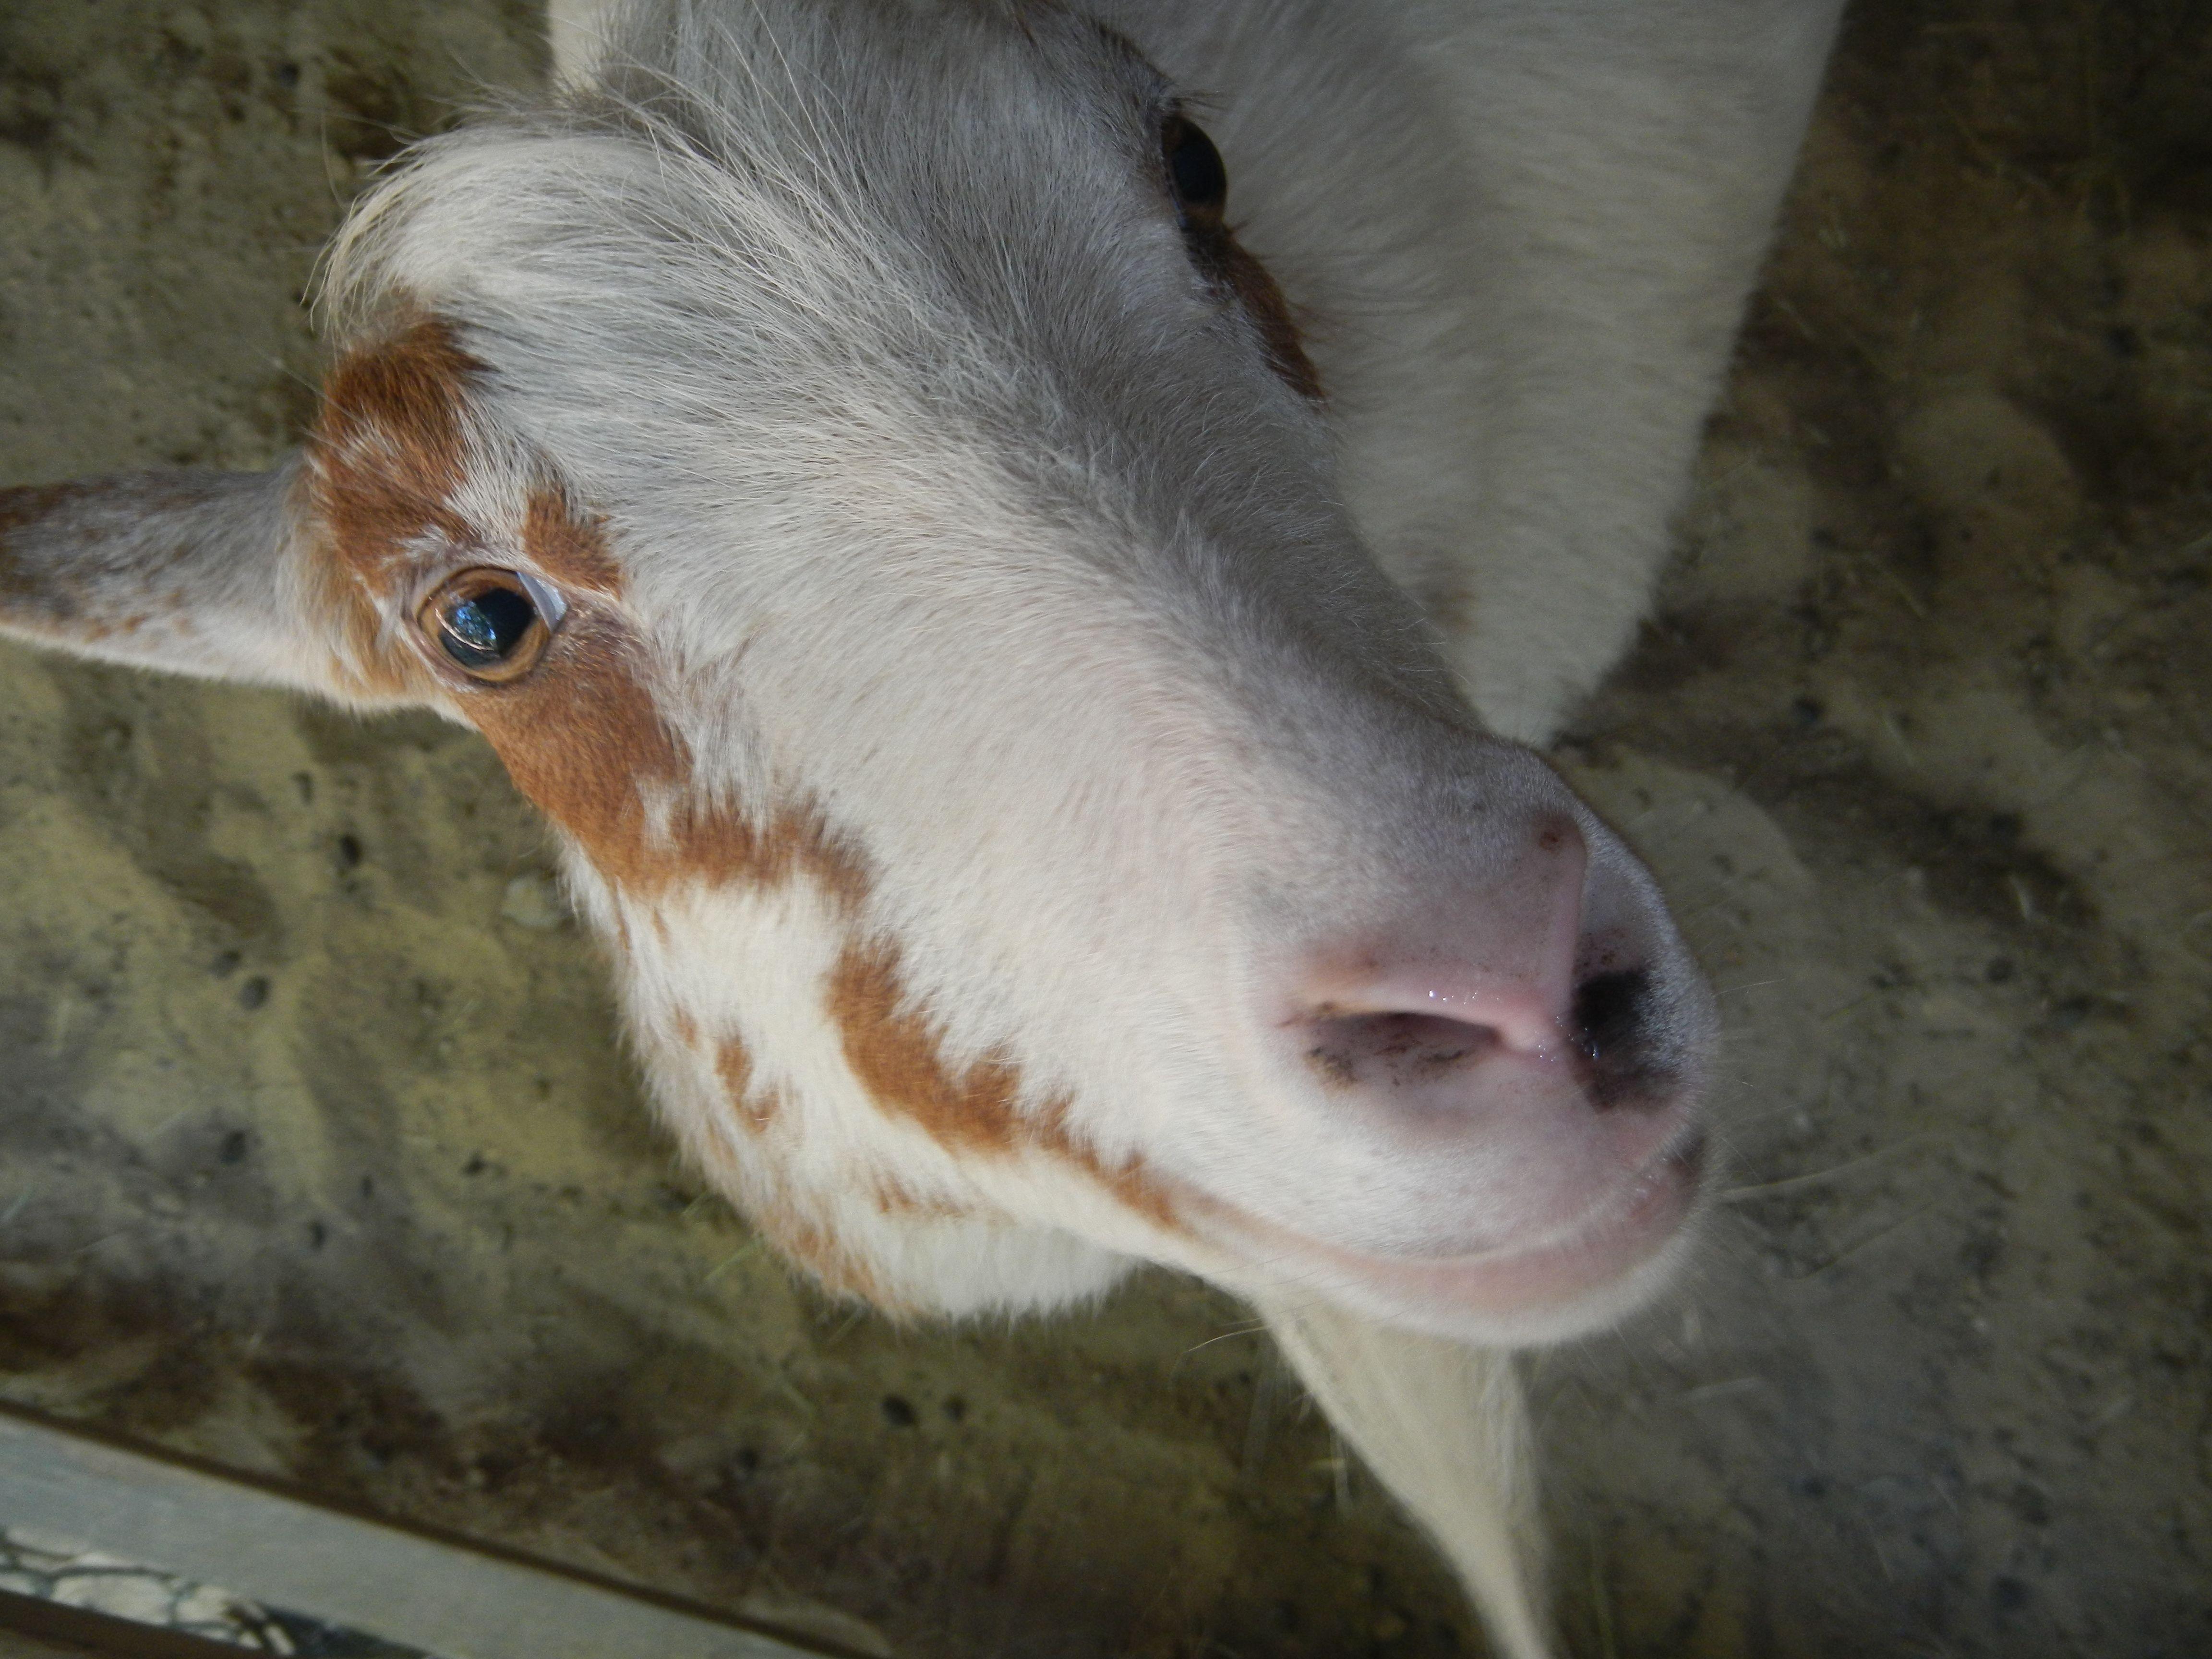 ian dwarf goats horns more information zone kev717 info pin by samantha ian dwarf goats horns